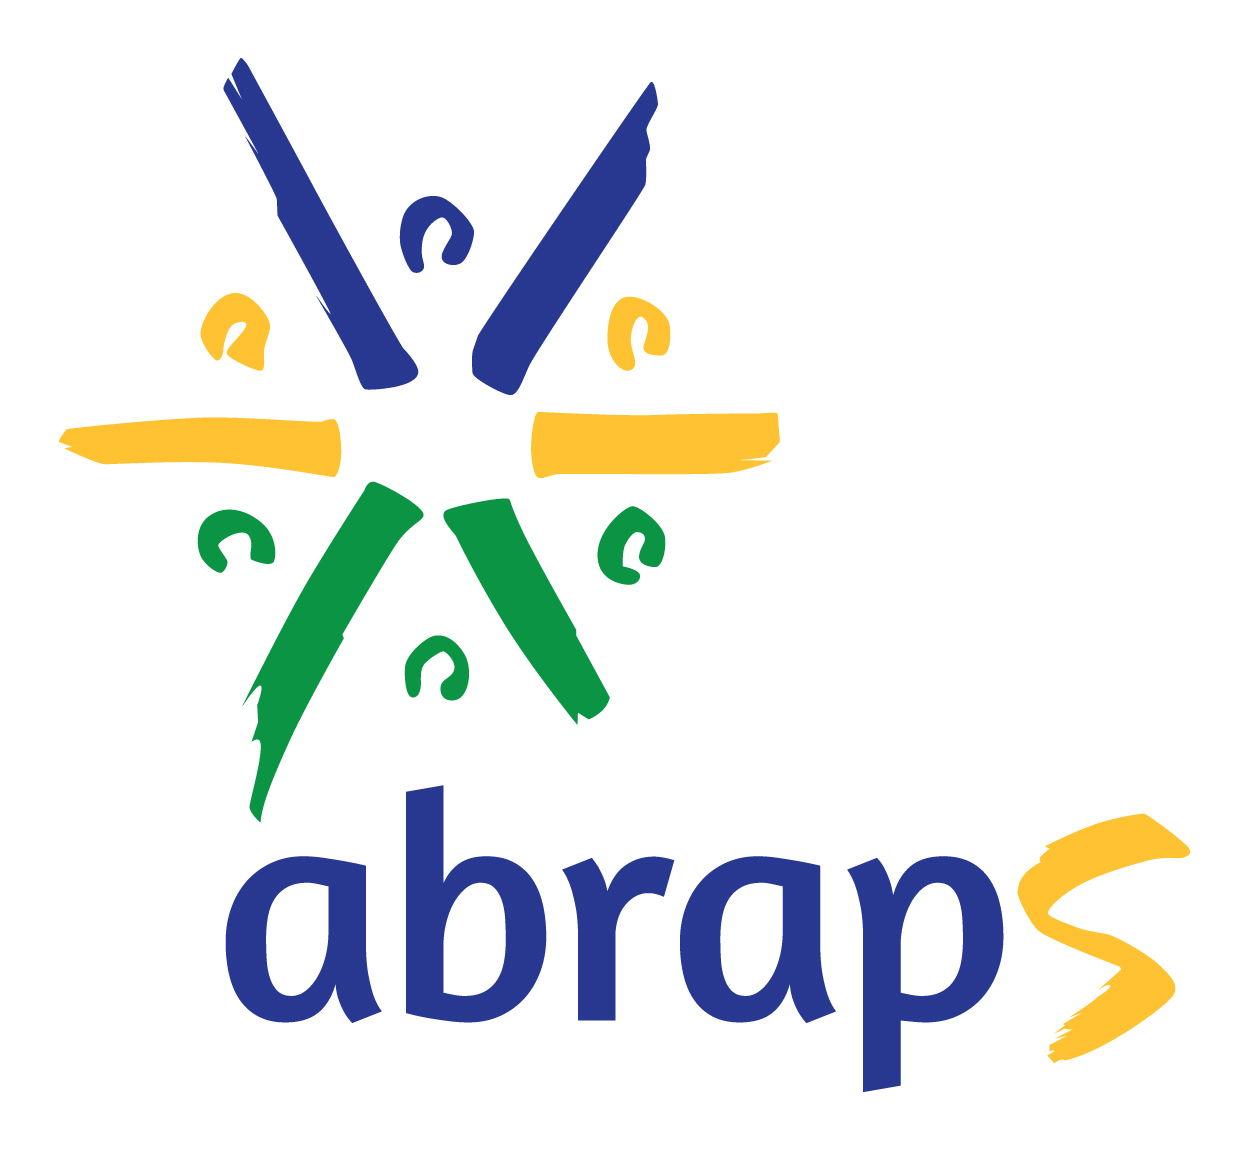 logo_abraps_ALTA.jpg